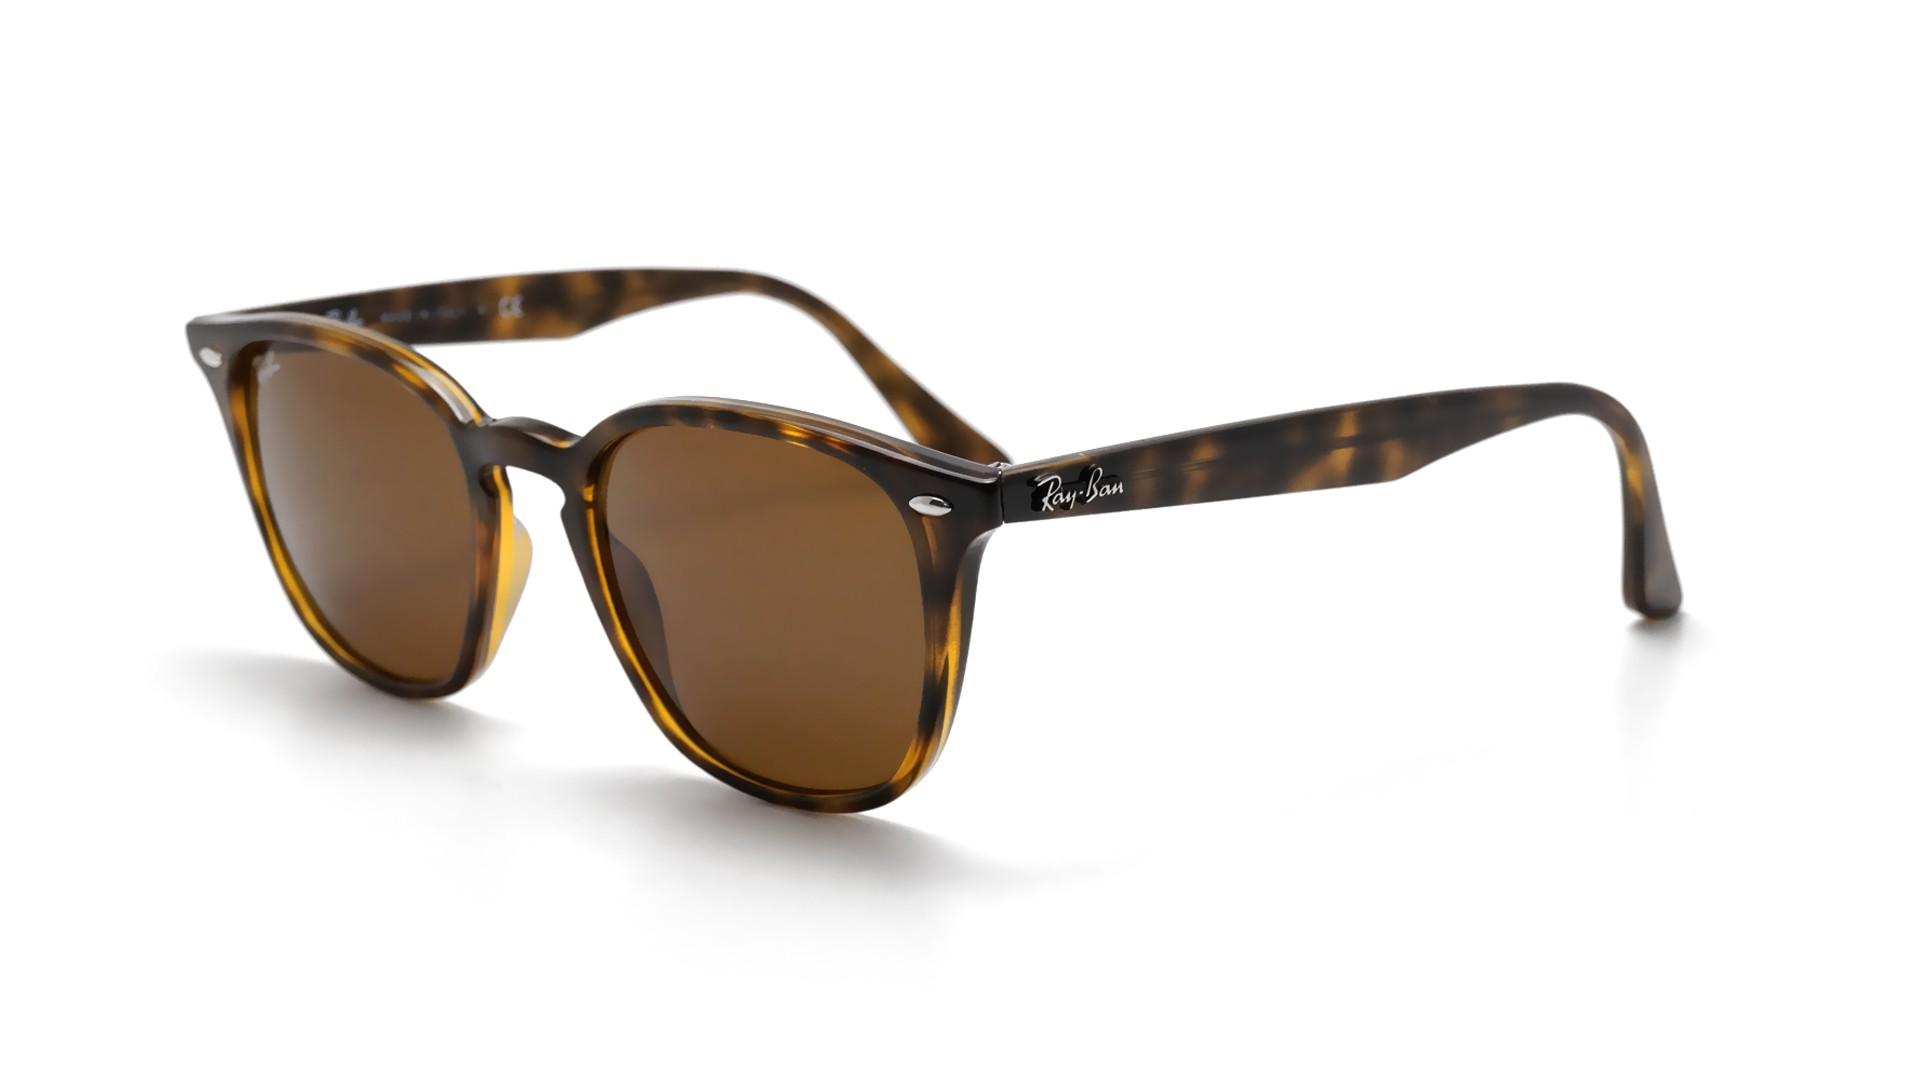 0ca5817380 ... closeout sunglasses ray ban rb4258 710 73 50 20 tortoise medium 99ce7  878b7